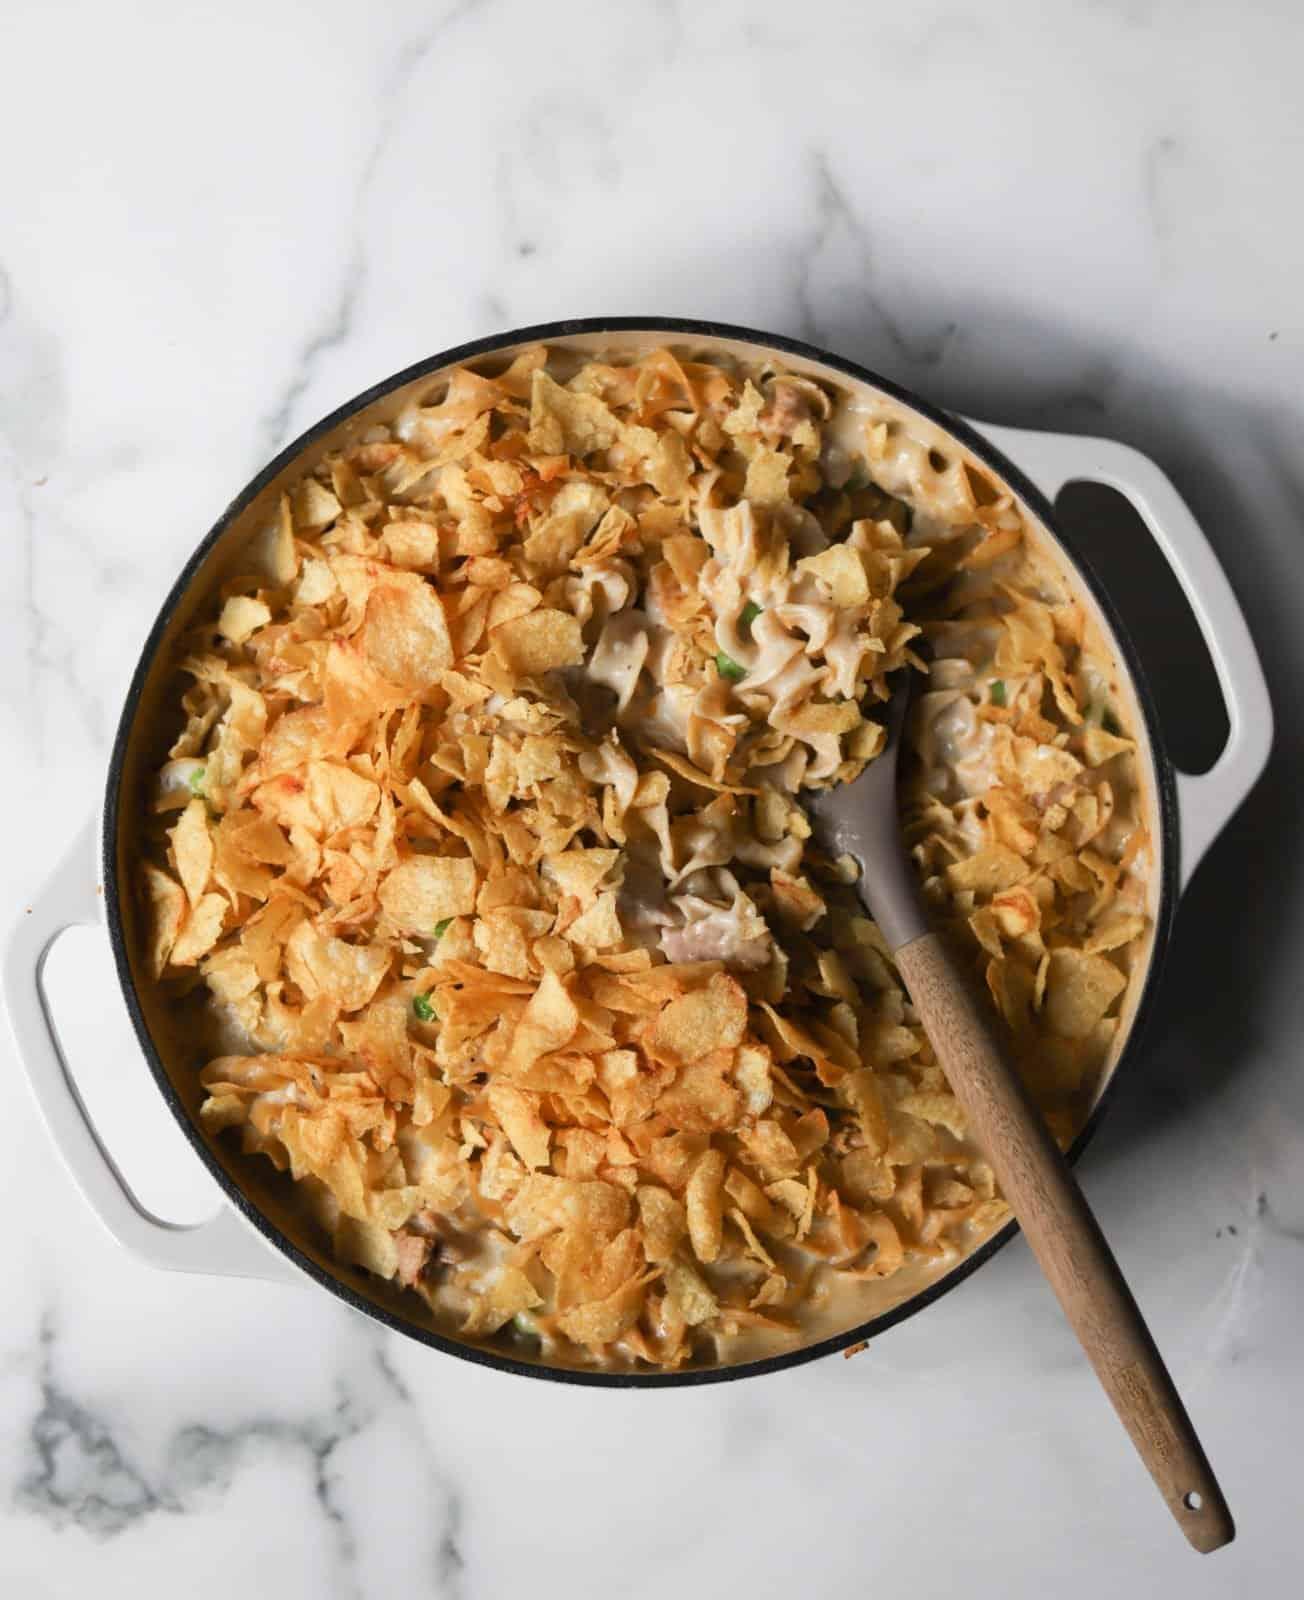 Finished Tuna Noodle Potato Chip Casserole recipe